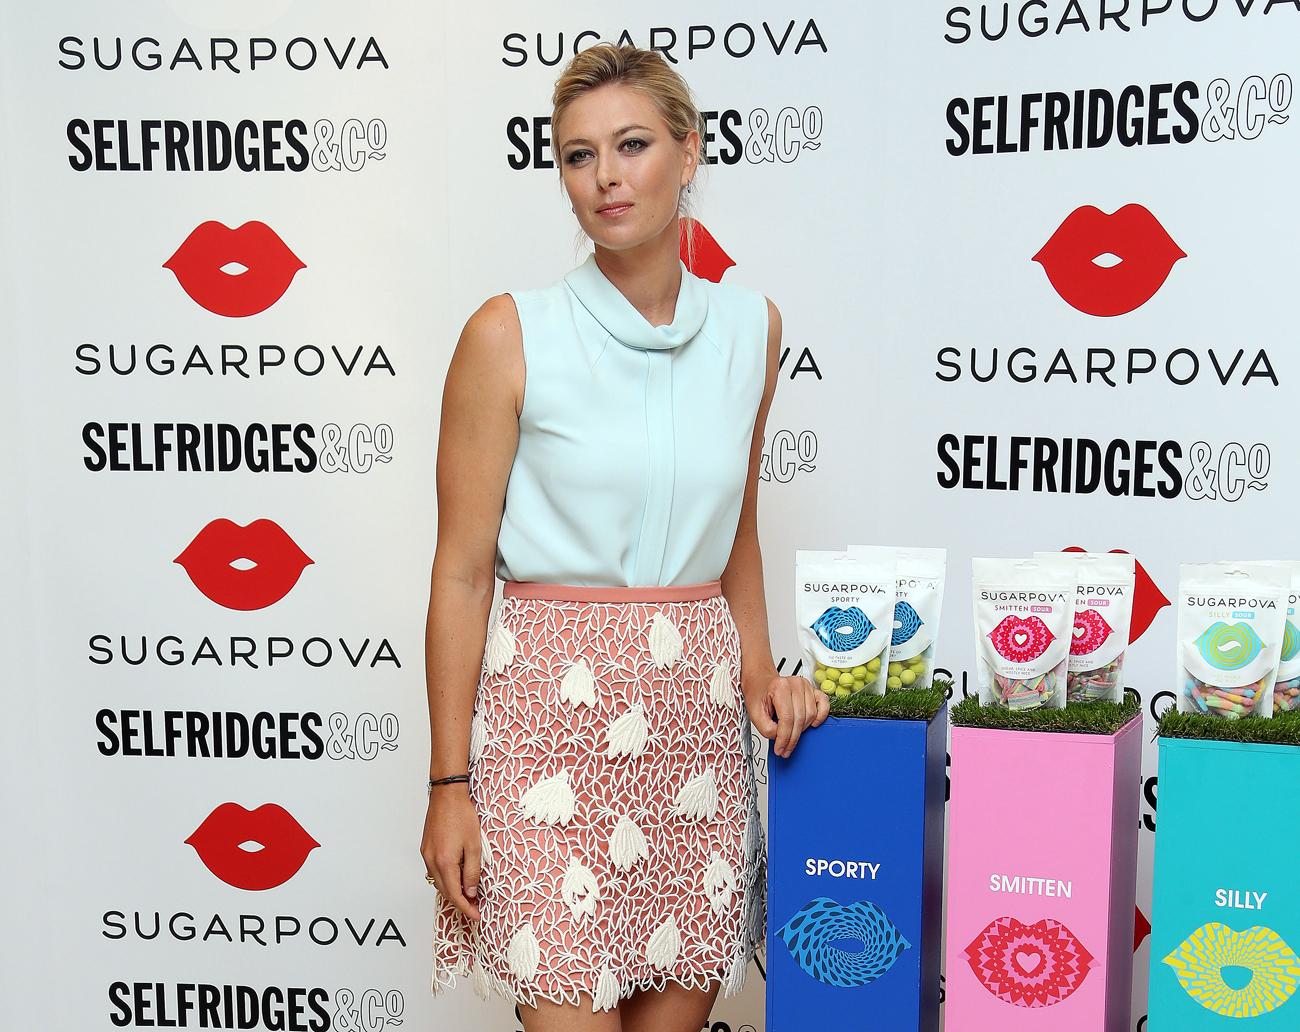 Bintang tenis Rusia Maria Sharapova berpose untuk foto dalam acara peluncuran Sugarpova, produk aneka permen terbarunya di toko Selfridges di pusat kota London. Sumber: AP